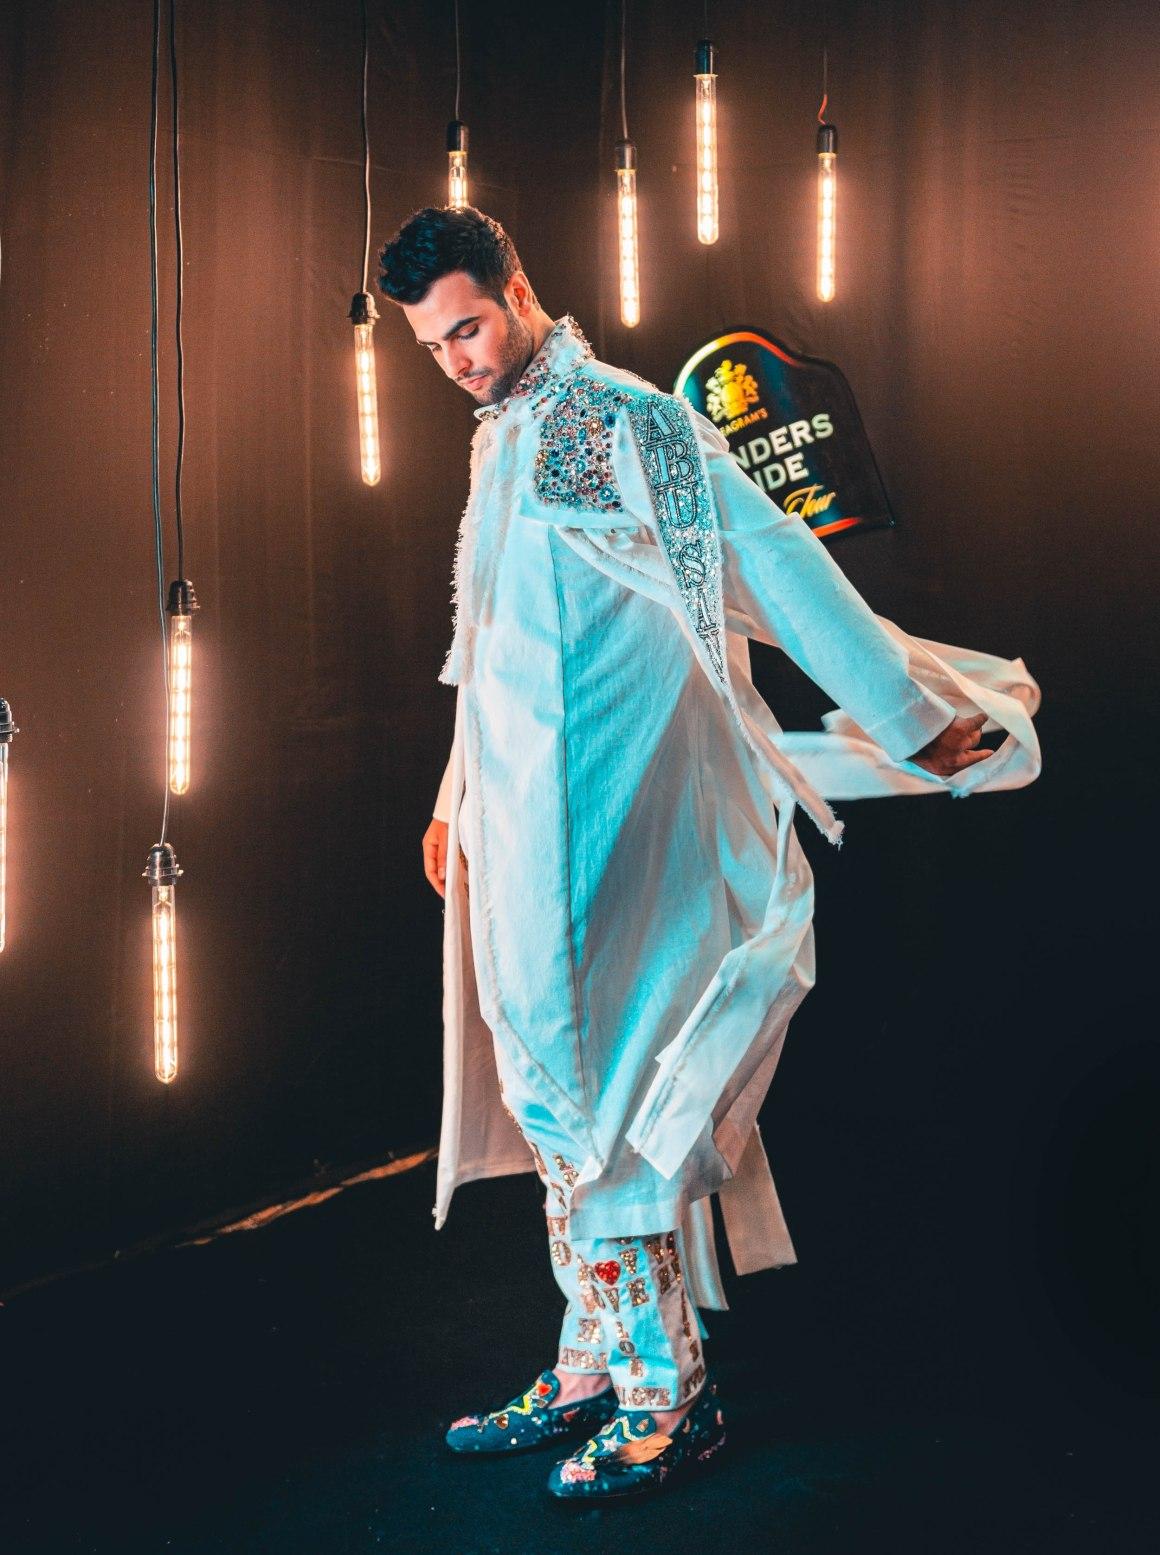 #EyesForFashion, #EyesForLifestyle, #MadeInIndia, bar, behind the scenes, Blenders Pride, Blenders Pride Whisky, Blenders Pride Fashion Tour, BlendersPrideFashionTour, BPFT, BPFT2020, Delhi, Client Photography Showcase, Experience Collector, Fashion Installation, Fashion Party, fashion photographer india, fashion show, Fashion Tour, Indian Models, lifestyle photographer, lifestyle photographer india, models, My Identity My Pride, MyExpressionMyPride, MyIdentityMyPride, MyStyleMyPride, My Blend My Pride, MyBlendMyPride, naina redhu, naina.co, NAINAxBPFT, pernod ricard, photo story, Photography Client, Preferred Professionals, professional photographer, professional photographer india, professional photography, White XP, White Media Marketing, Runway, Sara Ali Khan, Ankur Rathee, Abu Jani, Sandeep Khosla, AJSK, Whiskey, whisky, Whisky Event, WhiteBalance